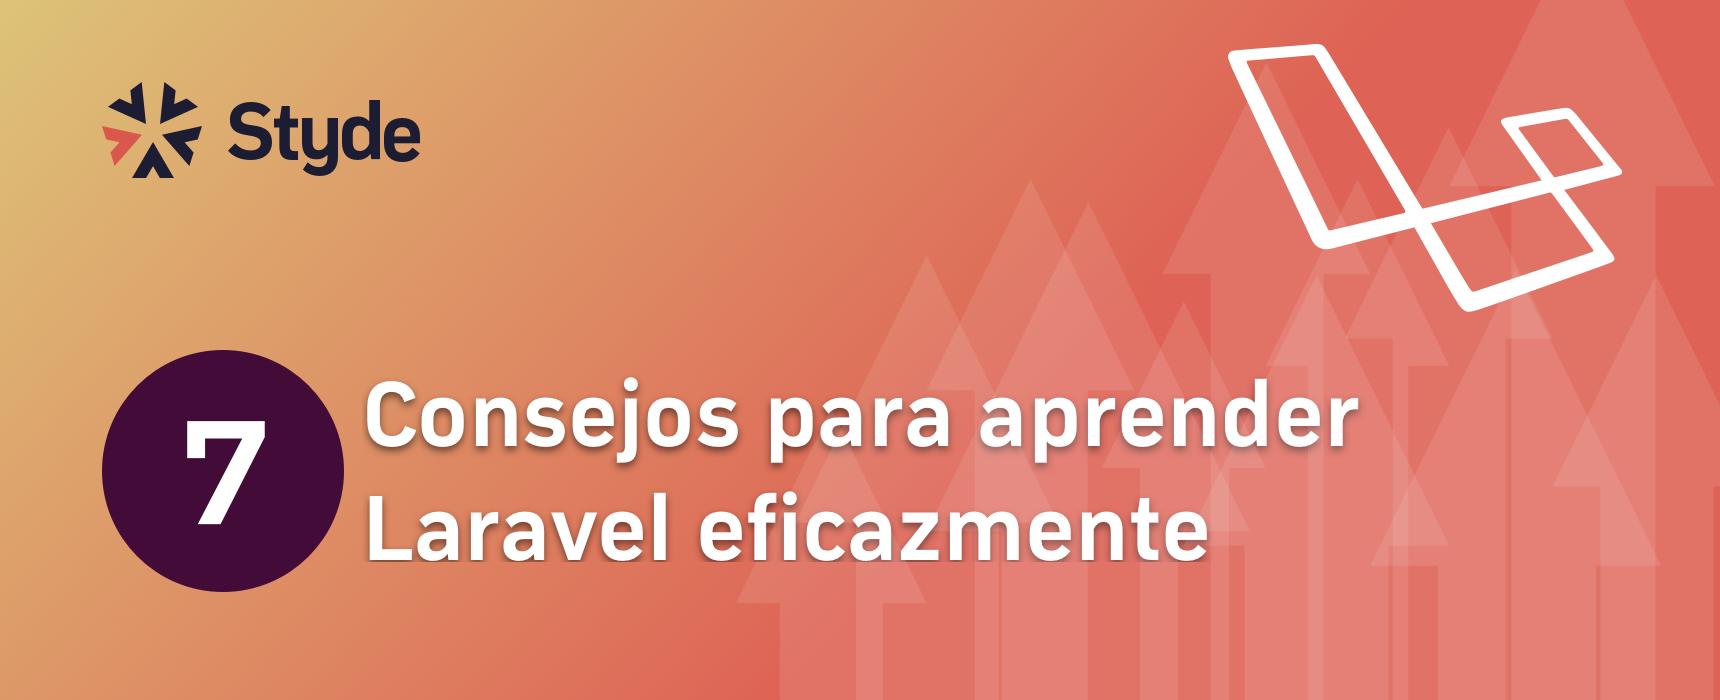 Siete consejos para aprender Laravel eficazmente – Styde.net